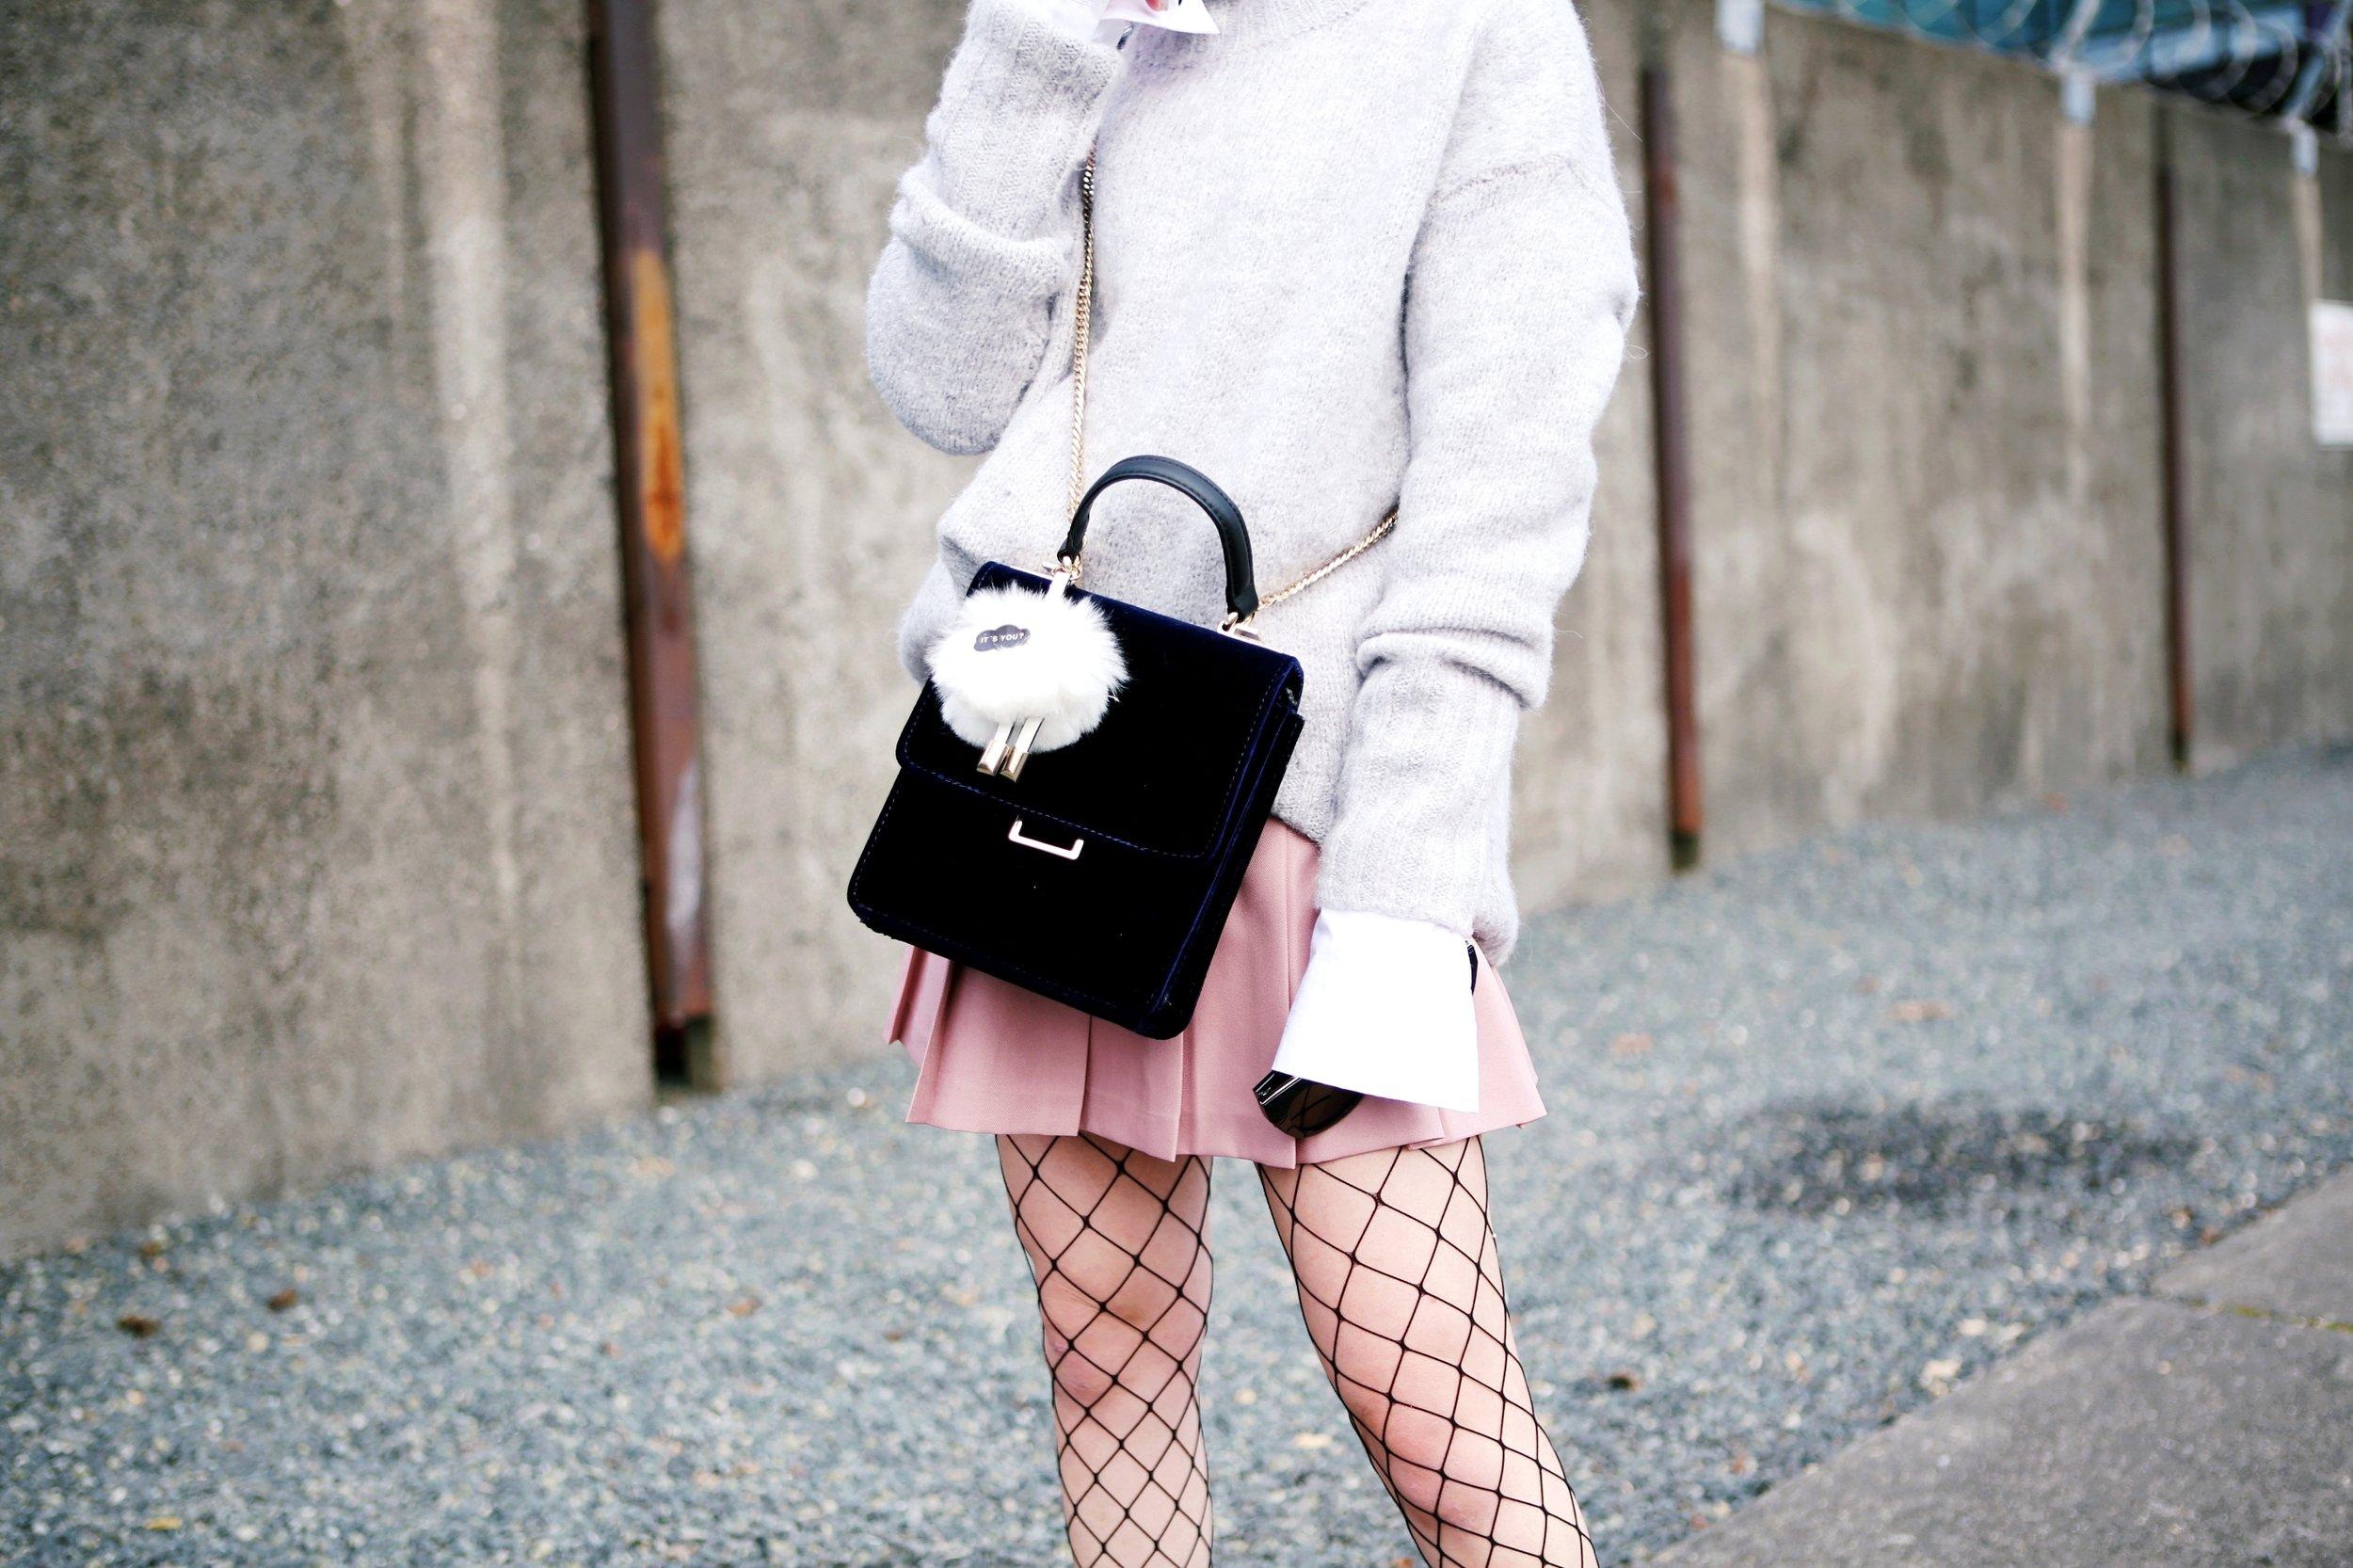 Isabel Marant News Boy Hat-H&M Gray Turtleneck Sweater-H&M Wide cuff Cotton Shirt-Forever 21 Pleated Mini Skirt-Boohoo Wide Fishnet Tights-ZARA Velvet Bag-ALDO Patent Booties-Le Specs Air Heart Sunglasses-Milani Black Cherry Lipstick-Aikas Love Closet-Seattle Style Lifestyle Blogger-japanese-pink hair 12